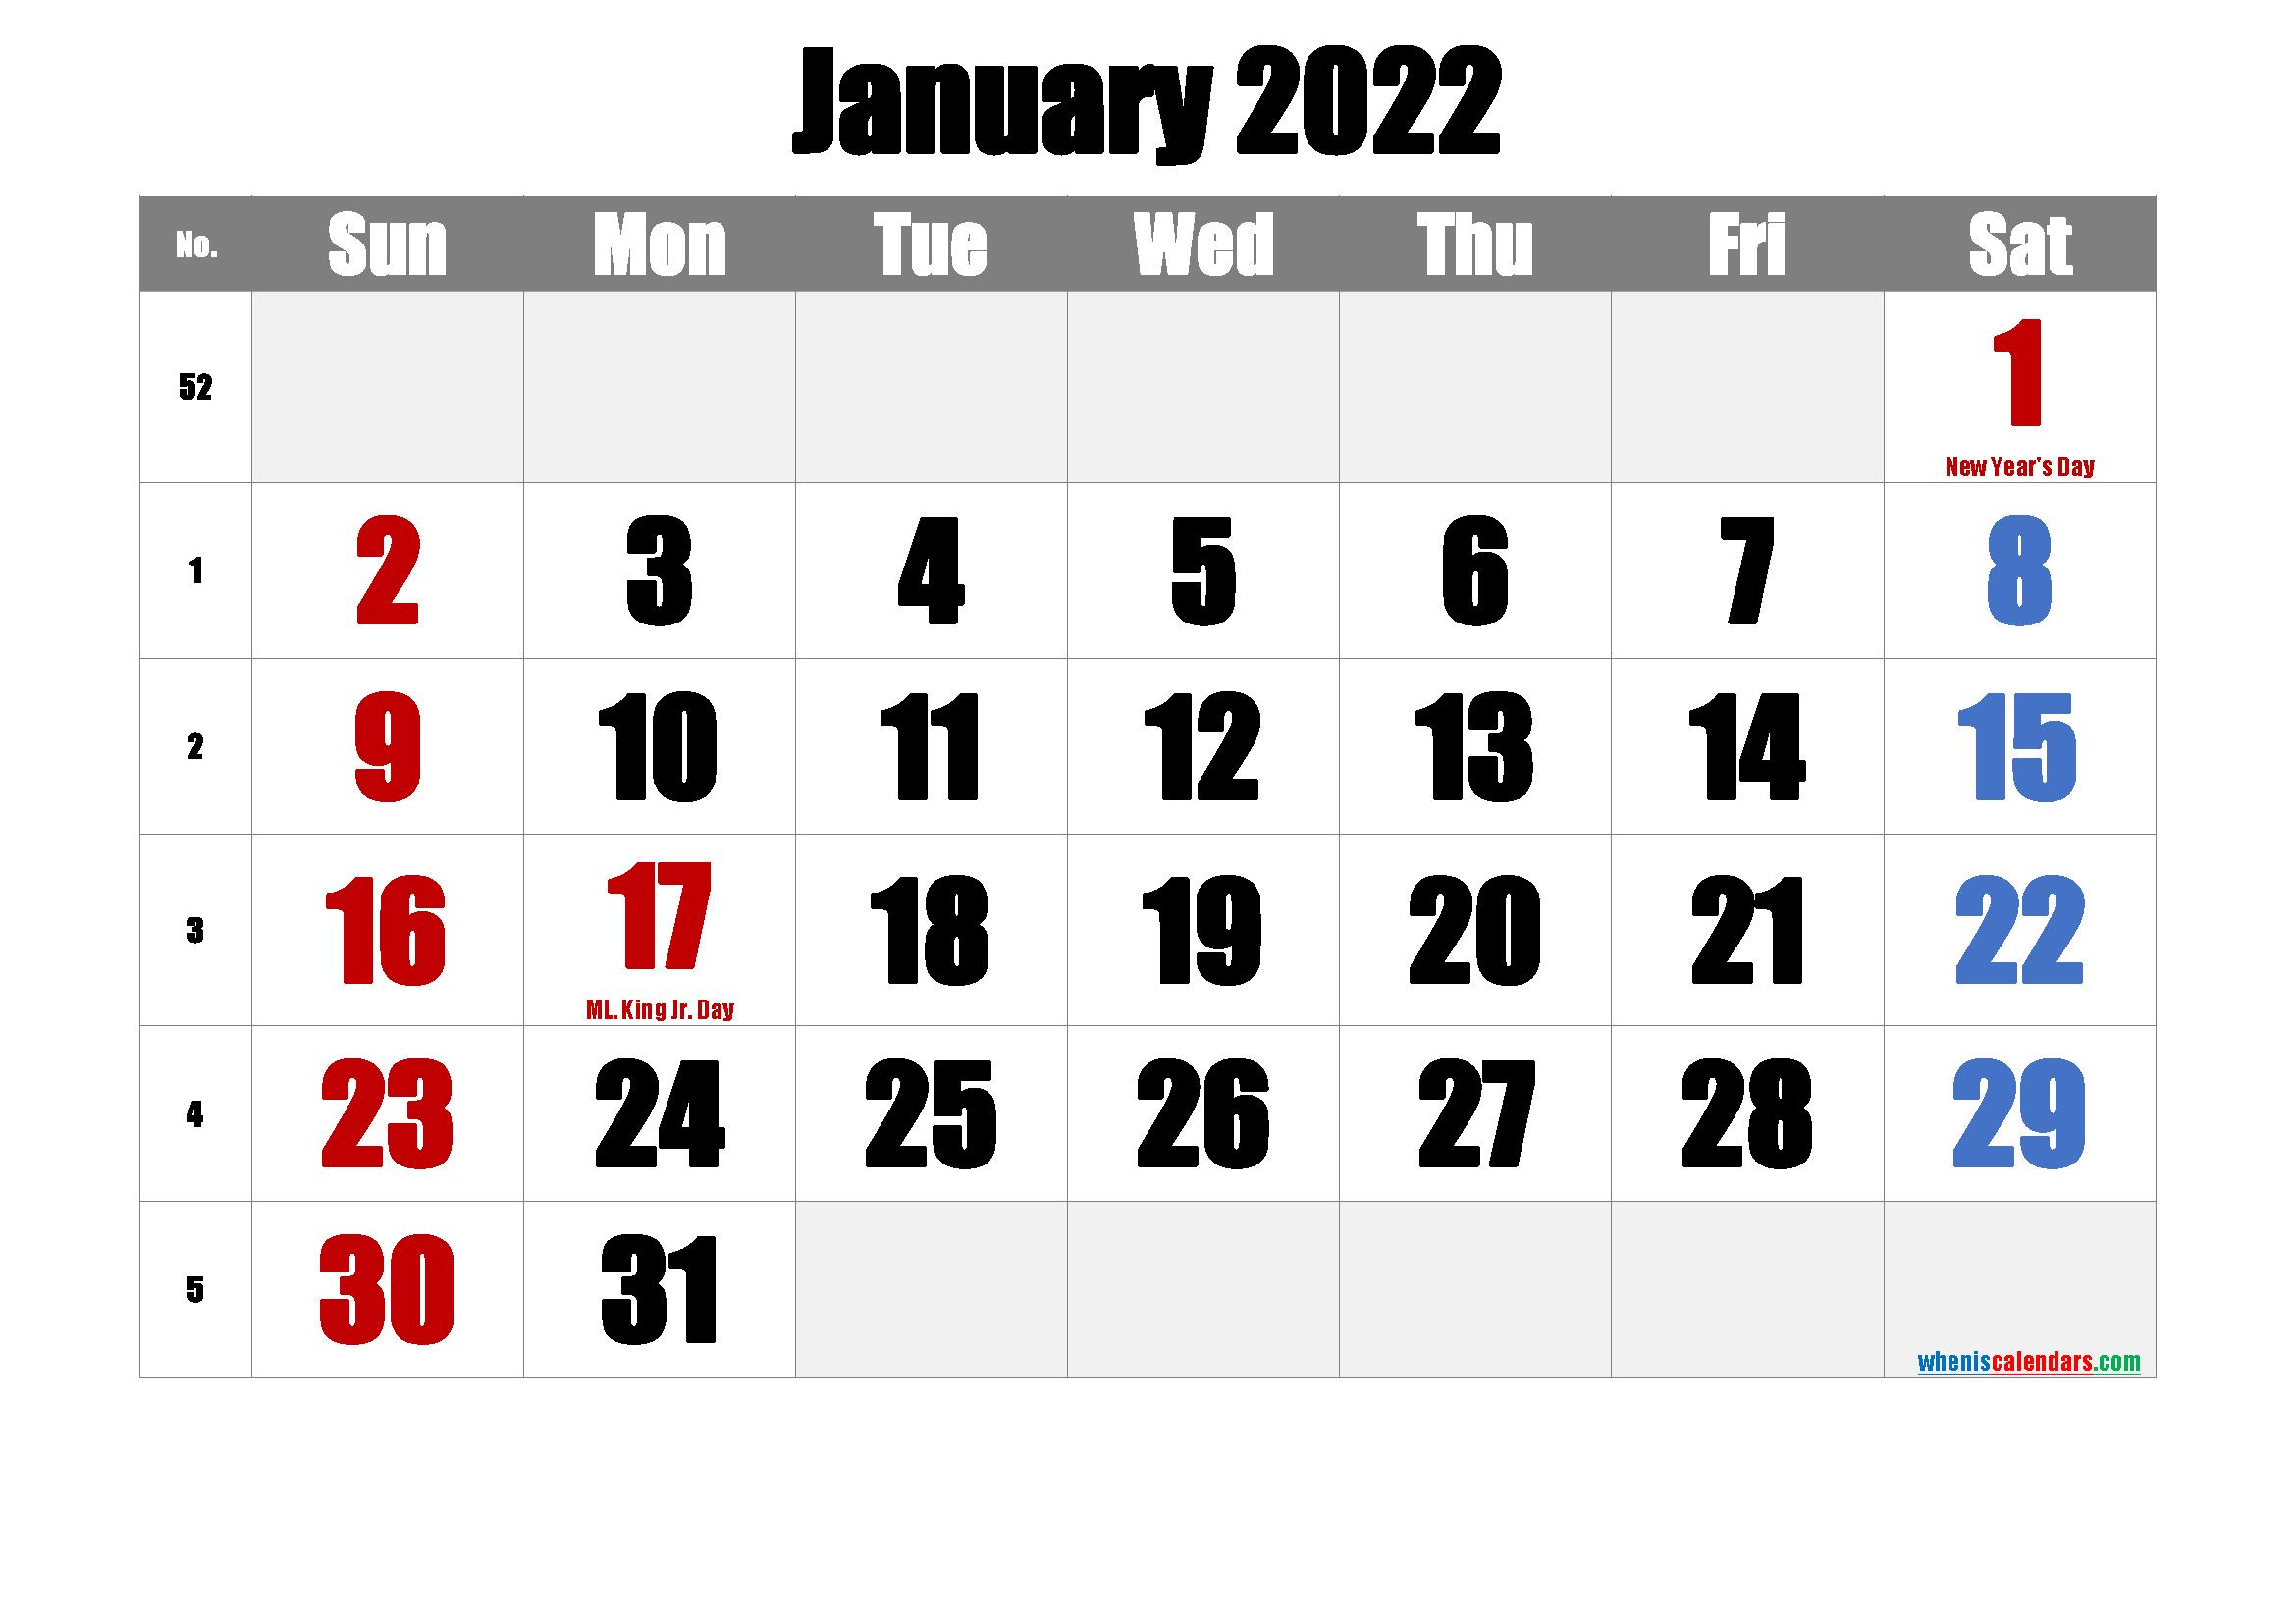 Printable January 2022 Calendar Pdf.Free Printable January 2022 Calendar Pdf And Png Calendar Printables Printable Calendar July 2021 Calendar